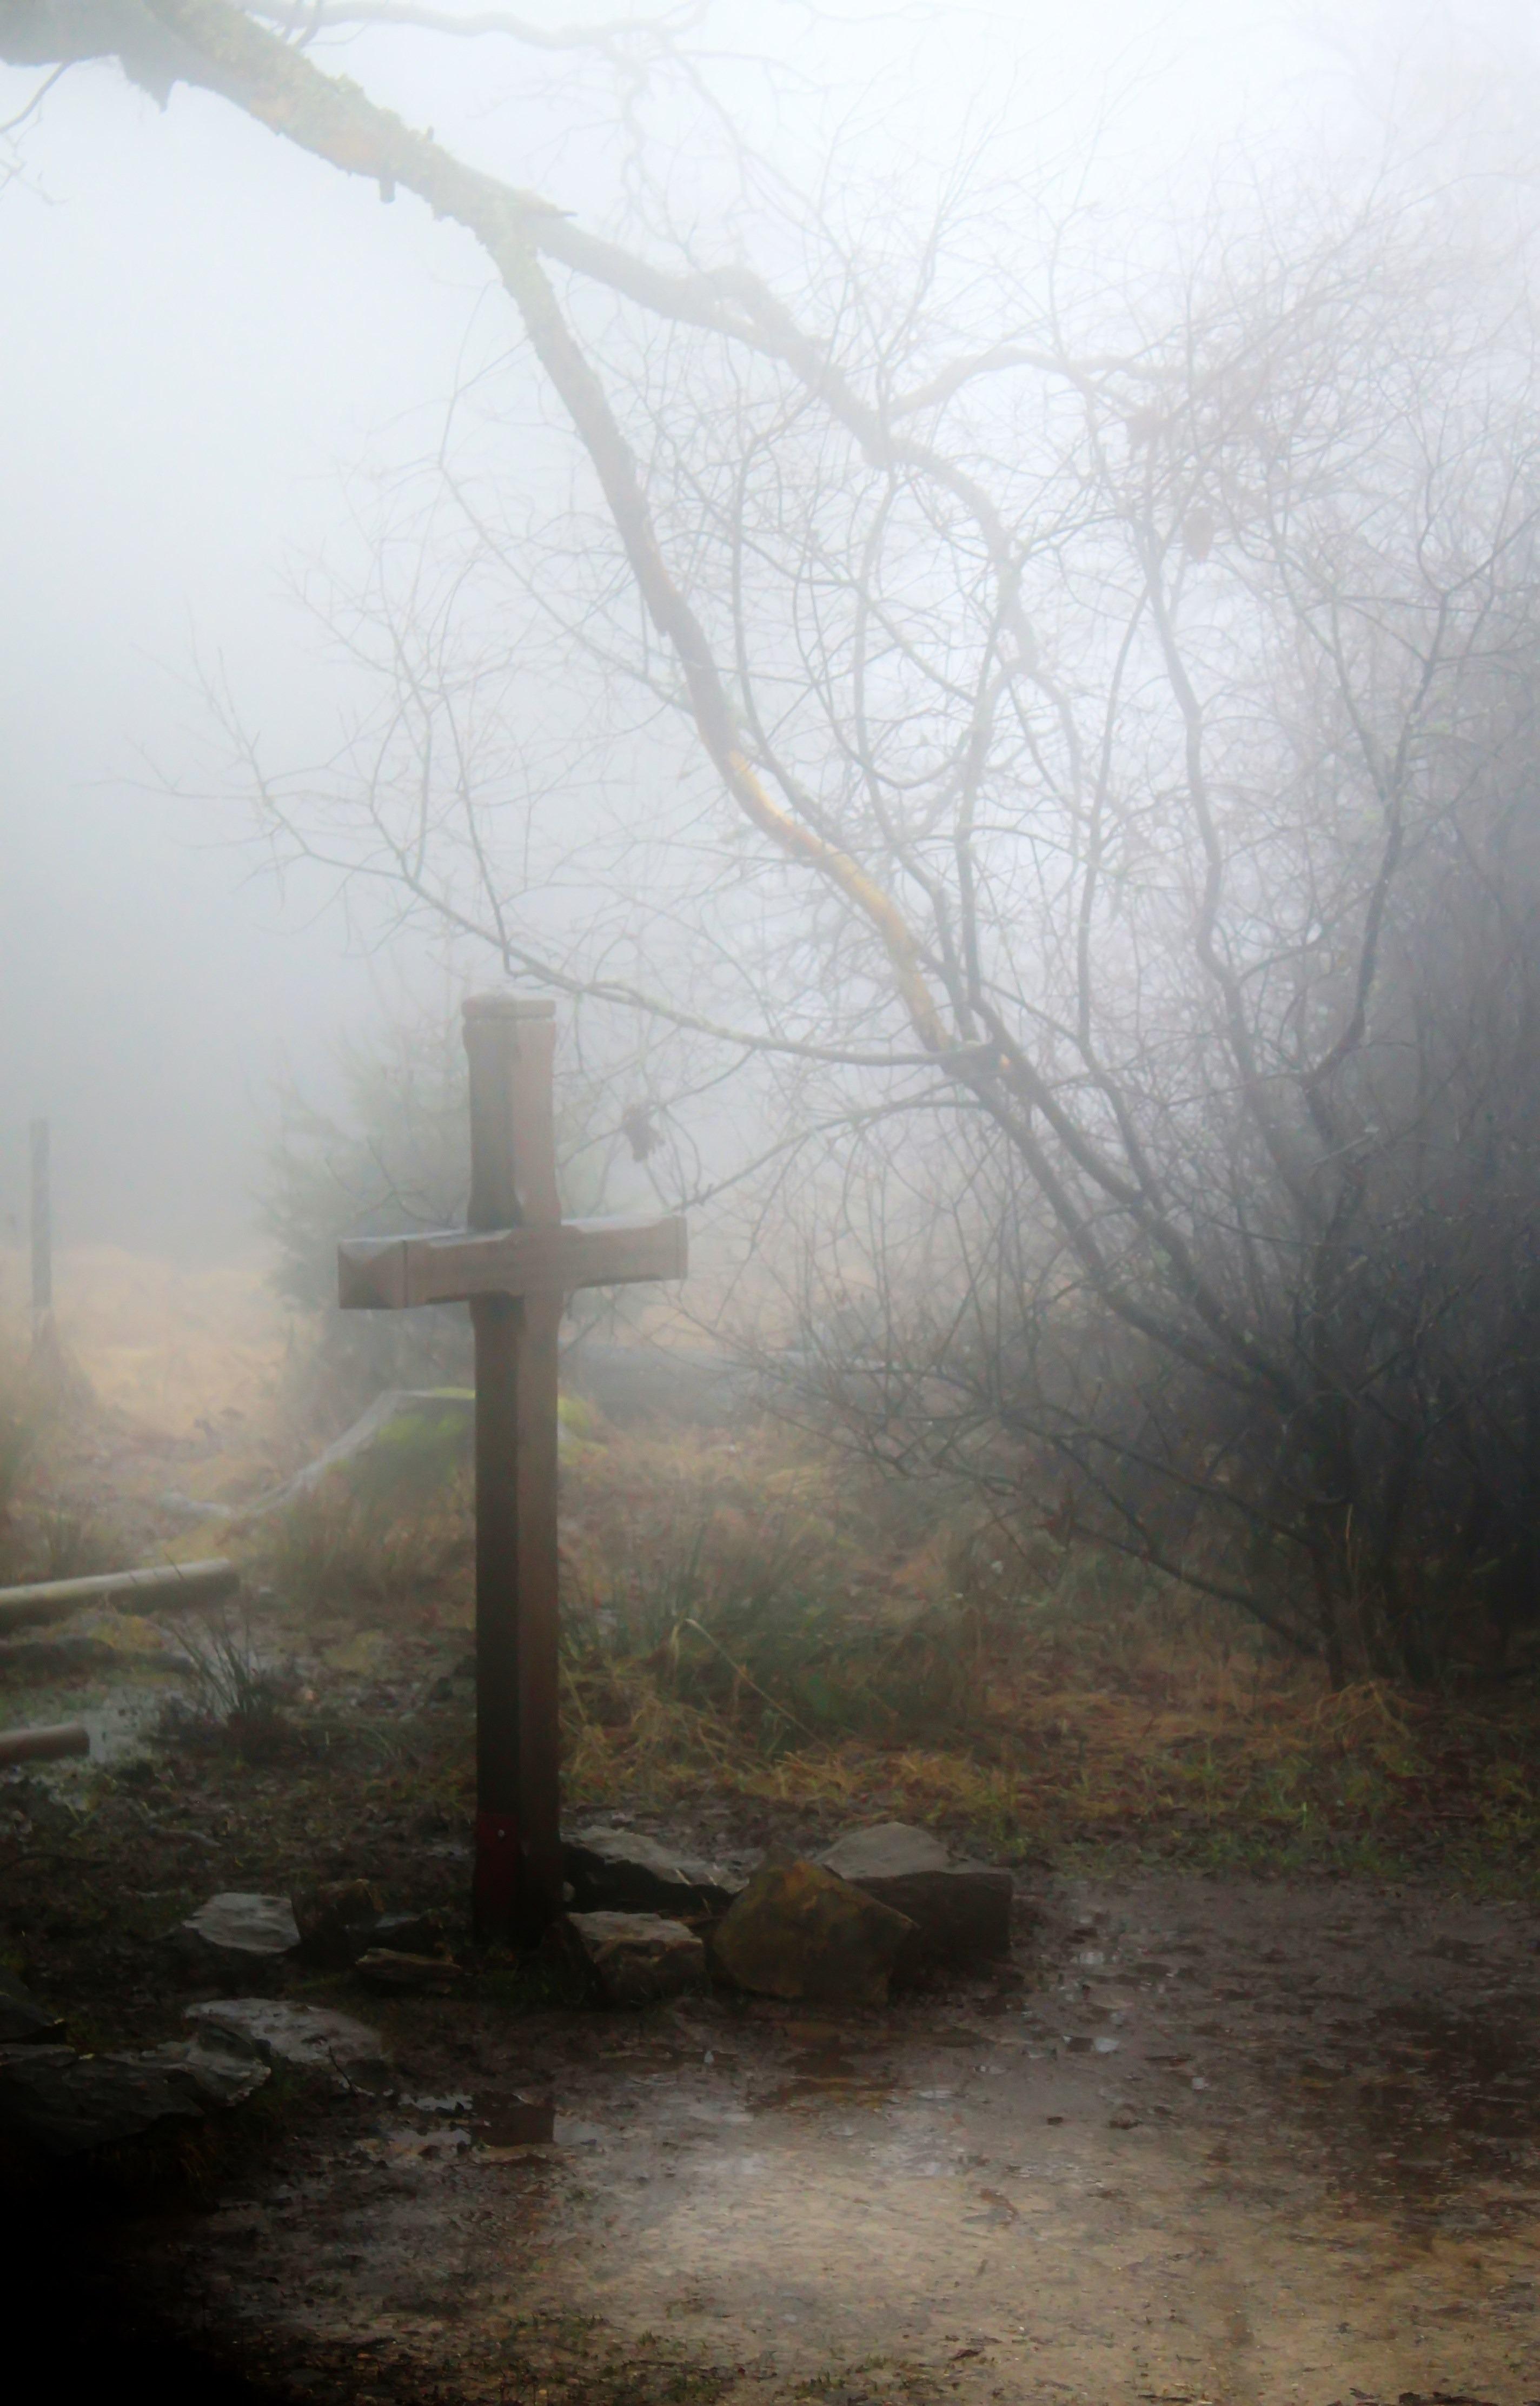 Foggy photo